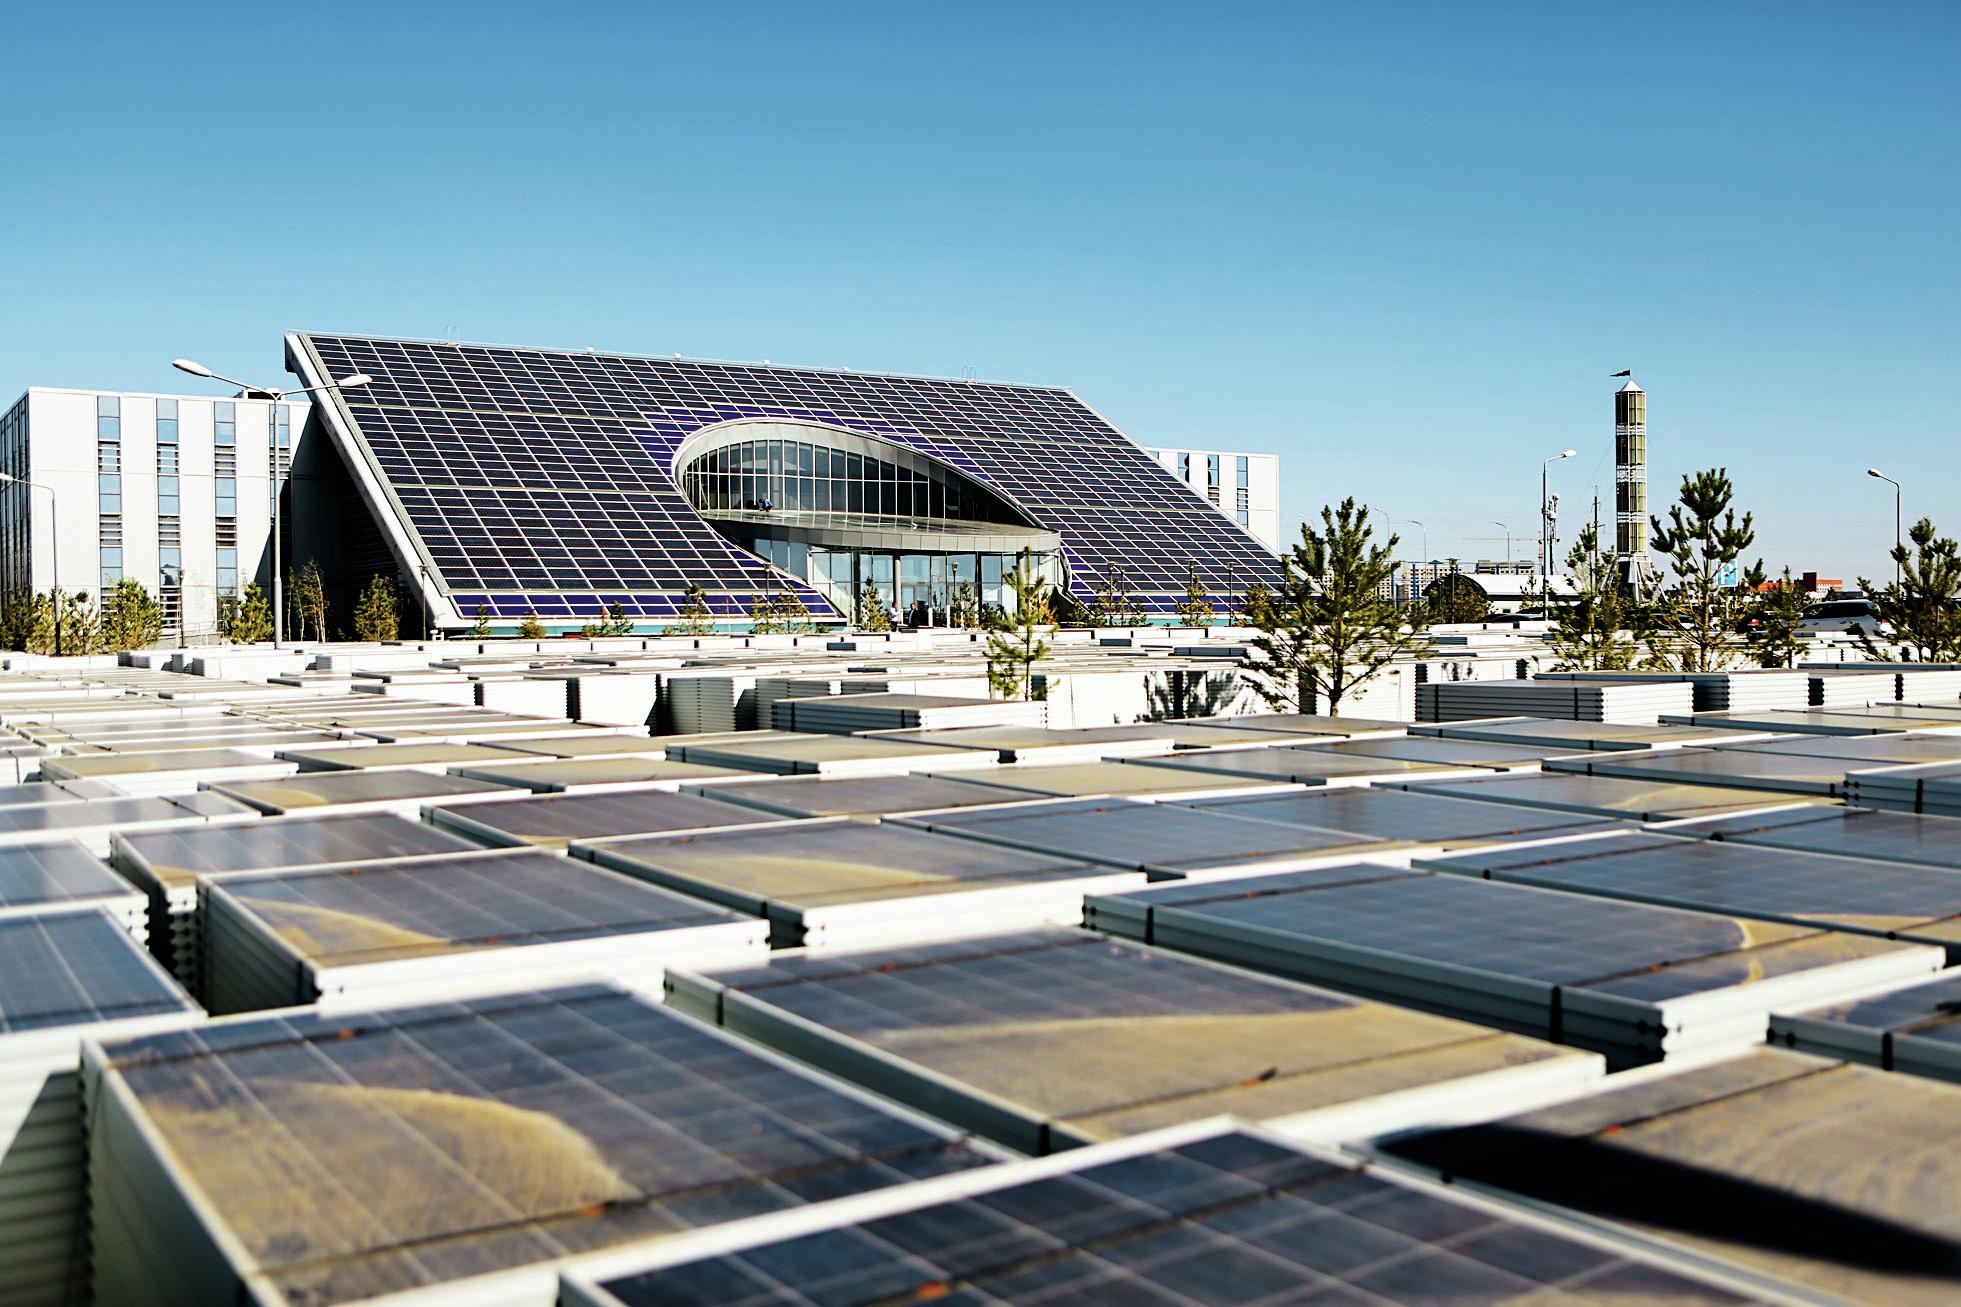 Grüne Energie in Kasachstan – Deutsche Energie-Agentur (dena)